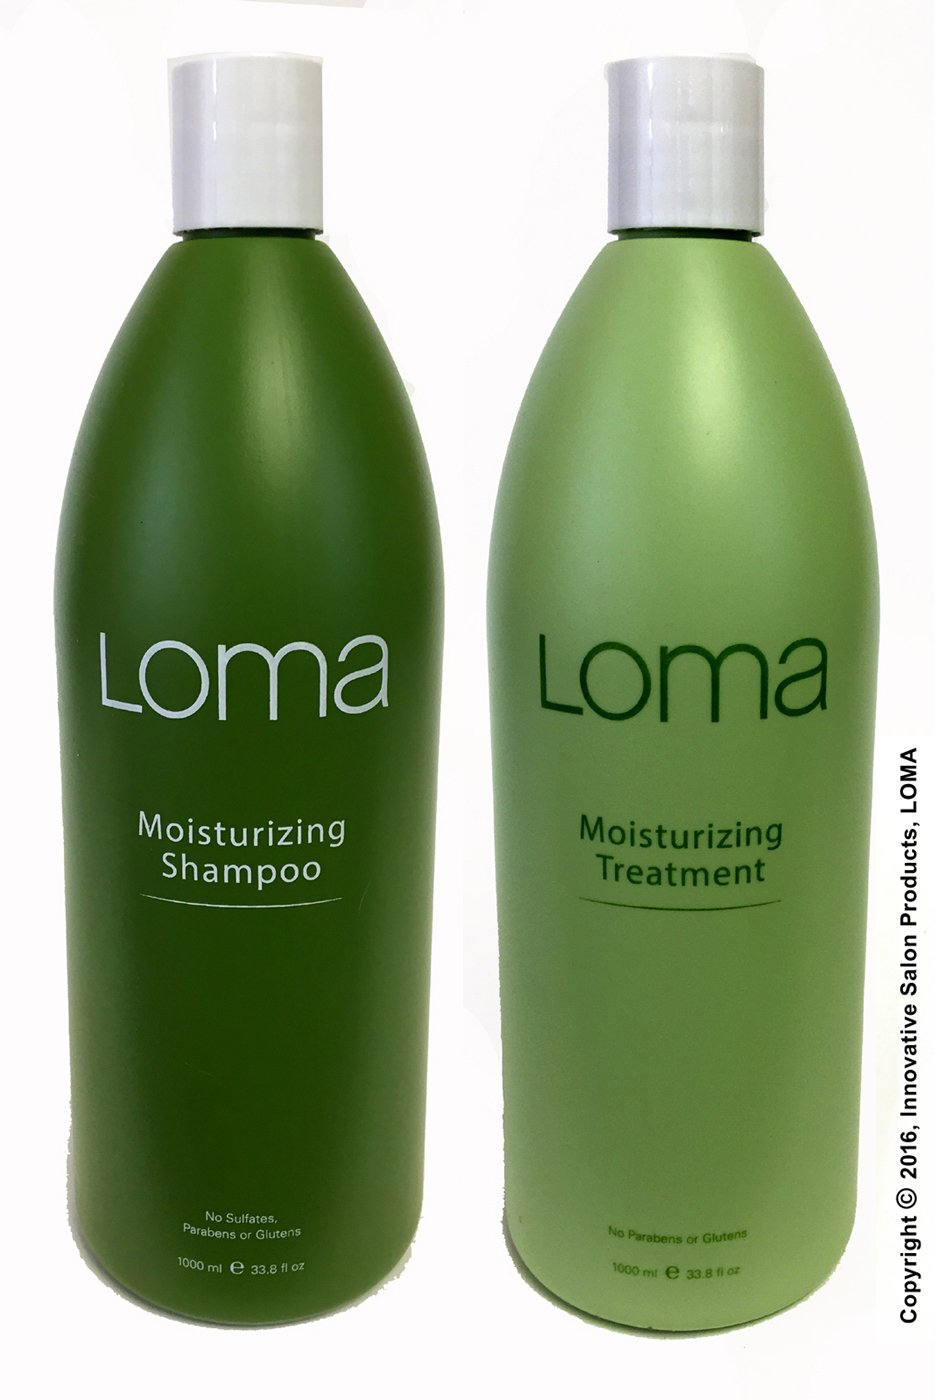 Loma Hair Care Moisturizing Shampoo and Moisturizing DUO PACK